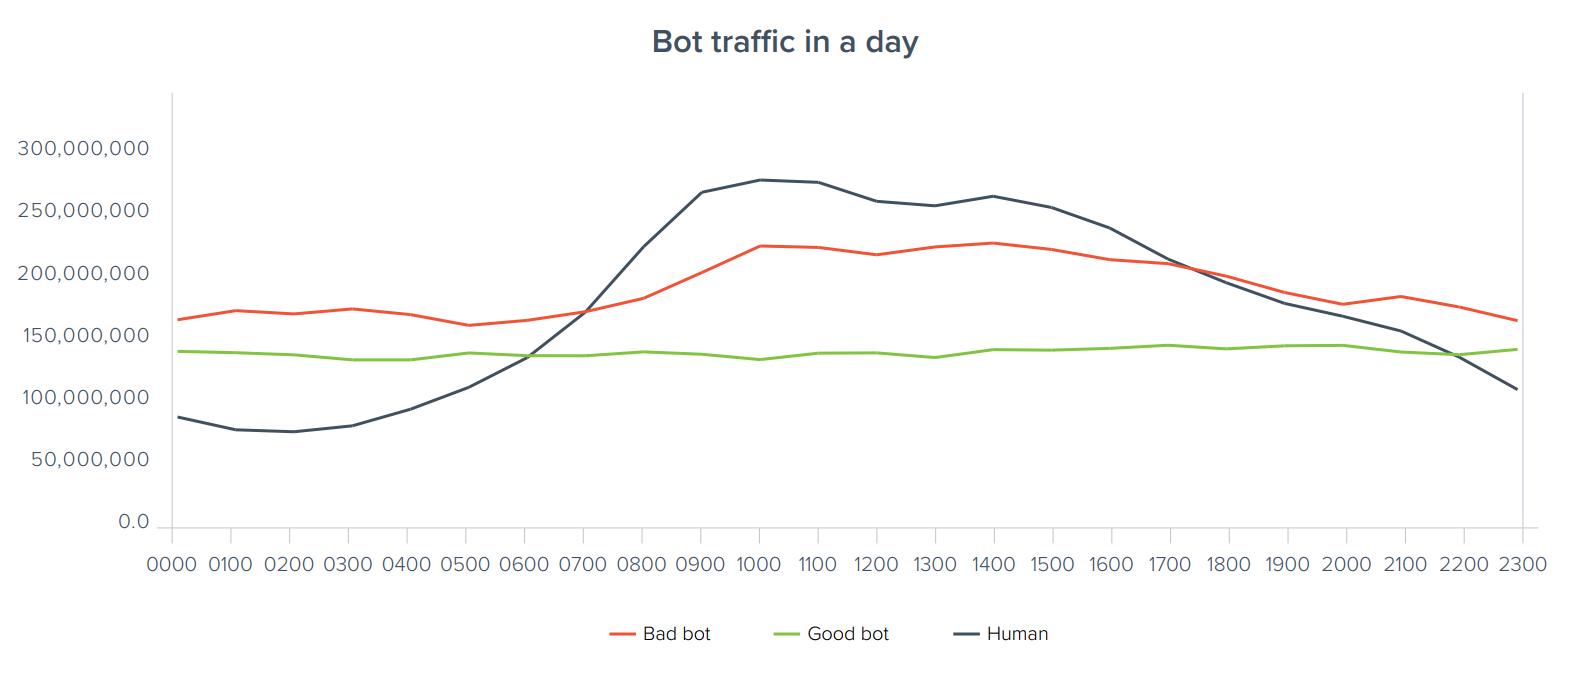 Bot behaviour peaks during work hours.